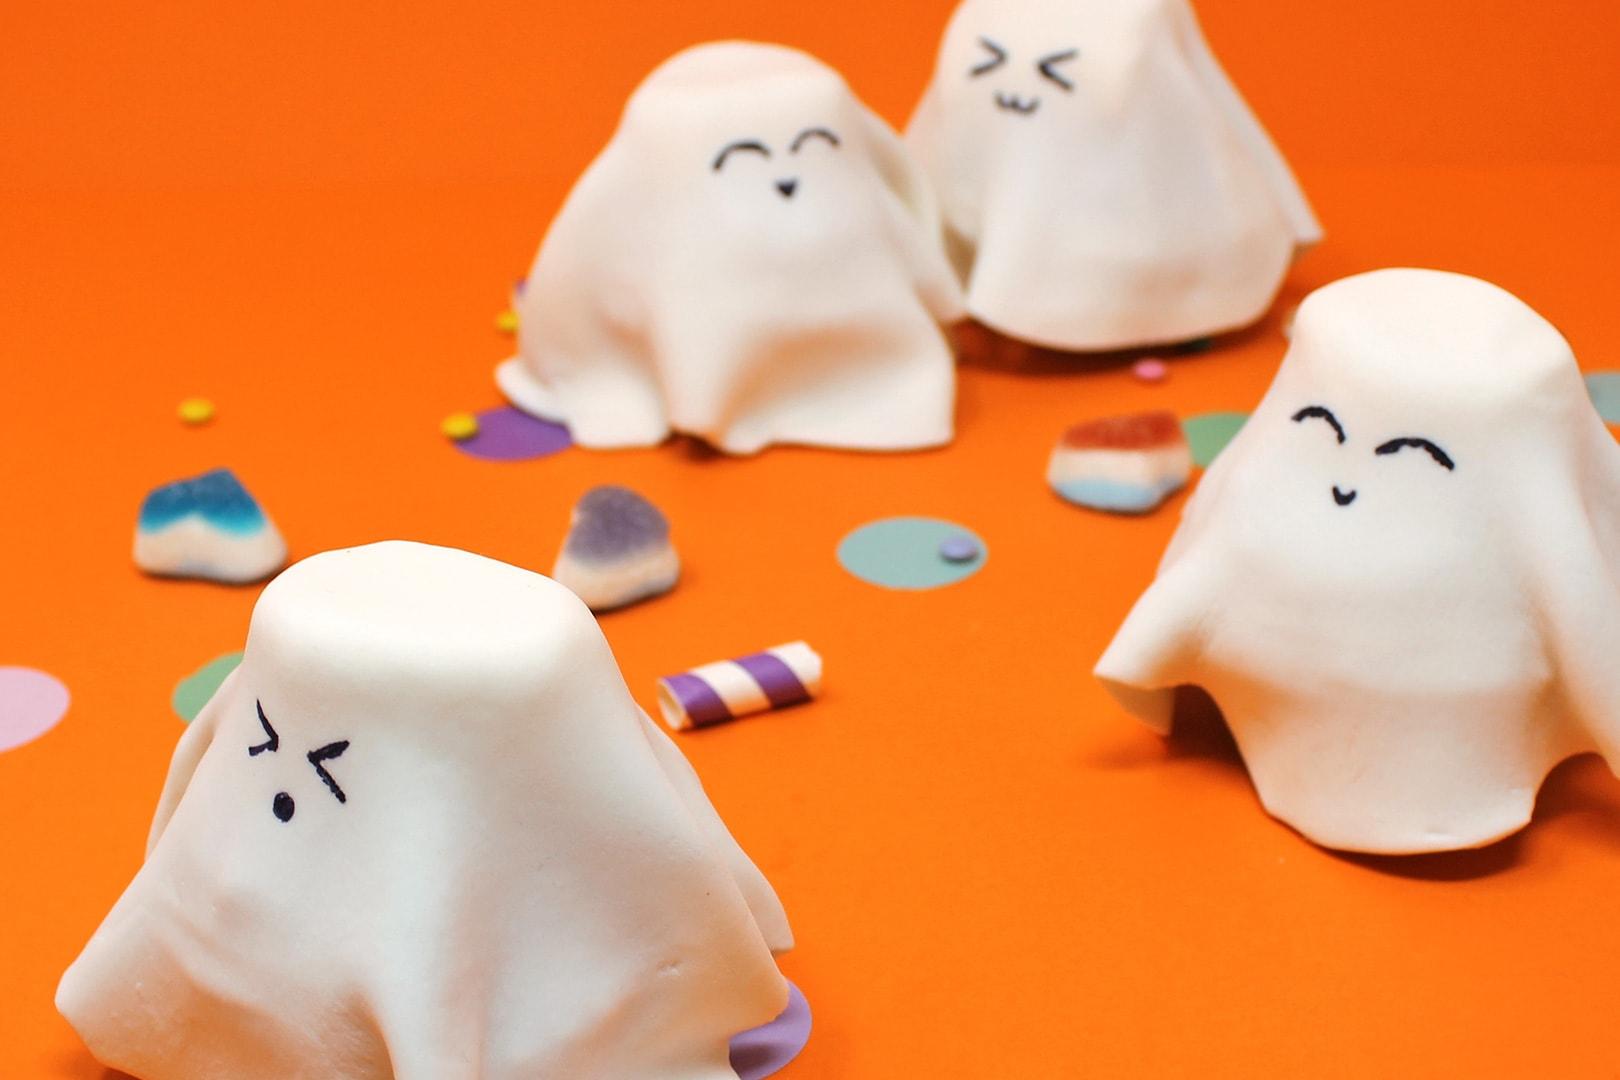 Dolci-fantasmi-halloween-super-colors-11-min